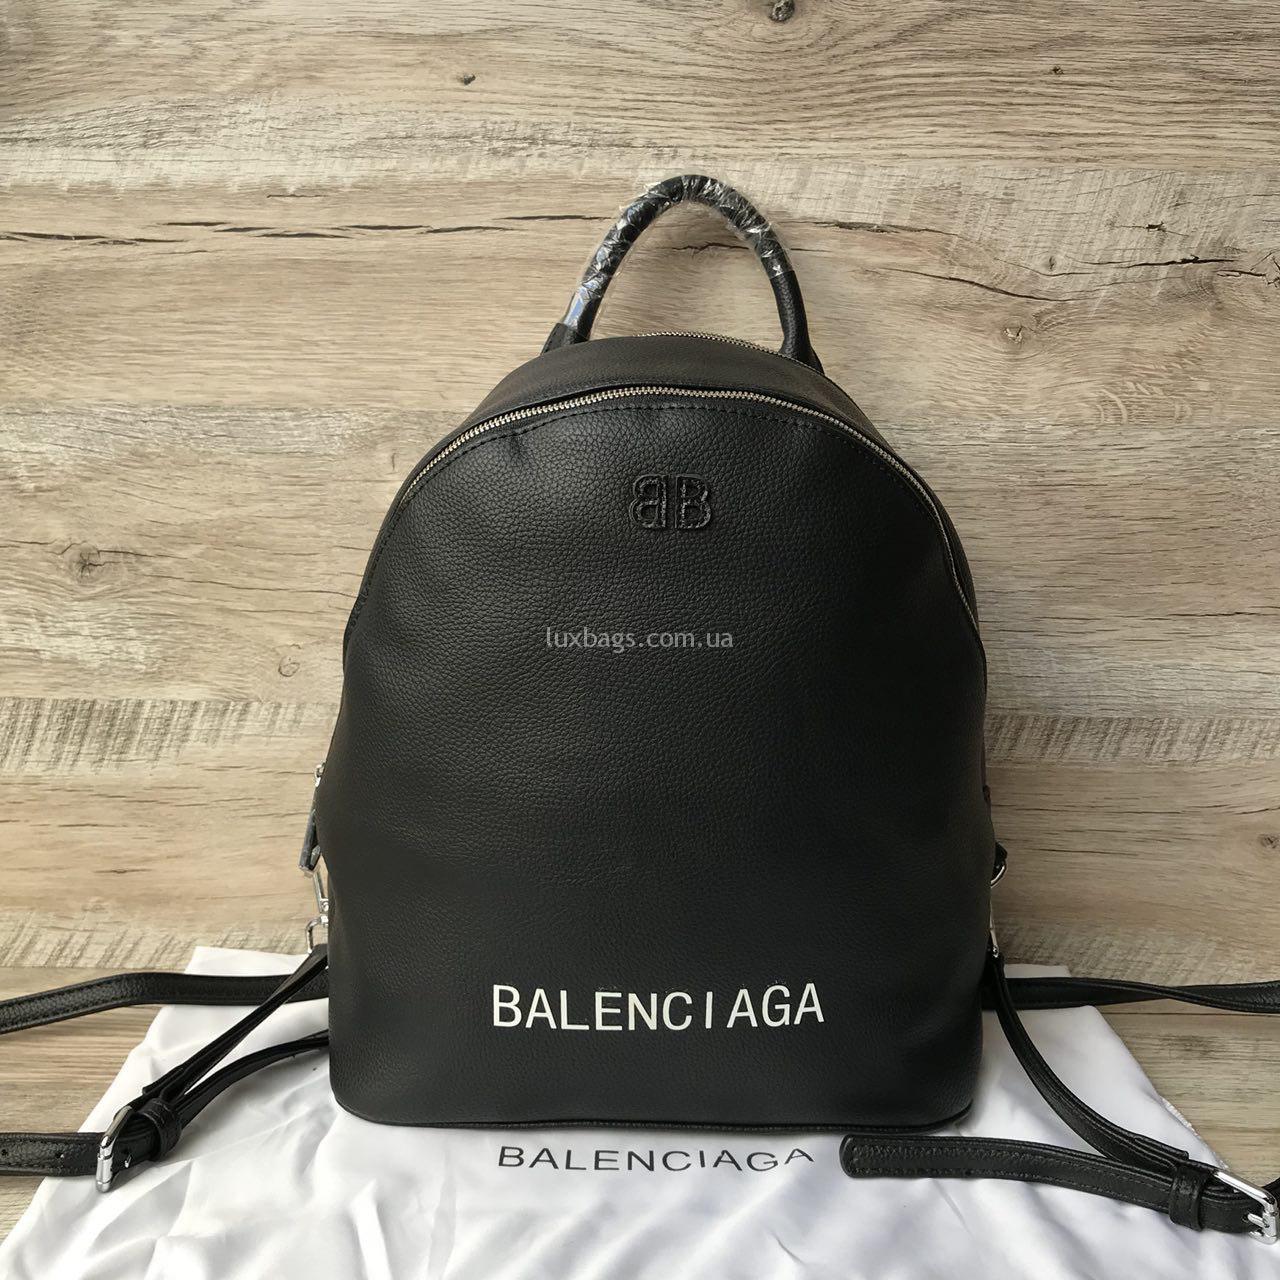 d50fe396ab30 Купить Женский рюкзак Balenciaga (Баленсиага) на lux-bags